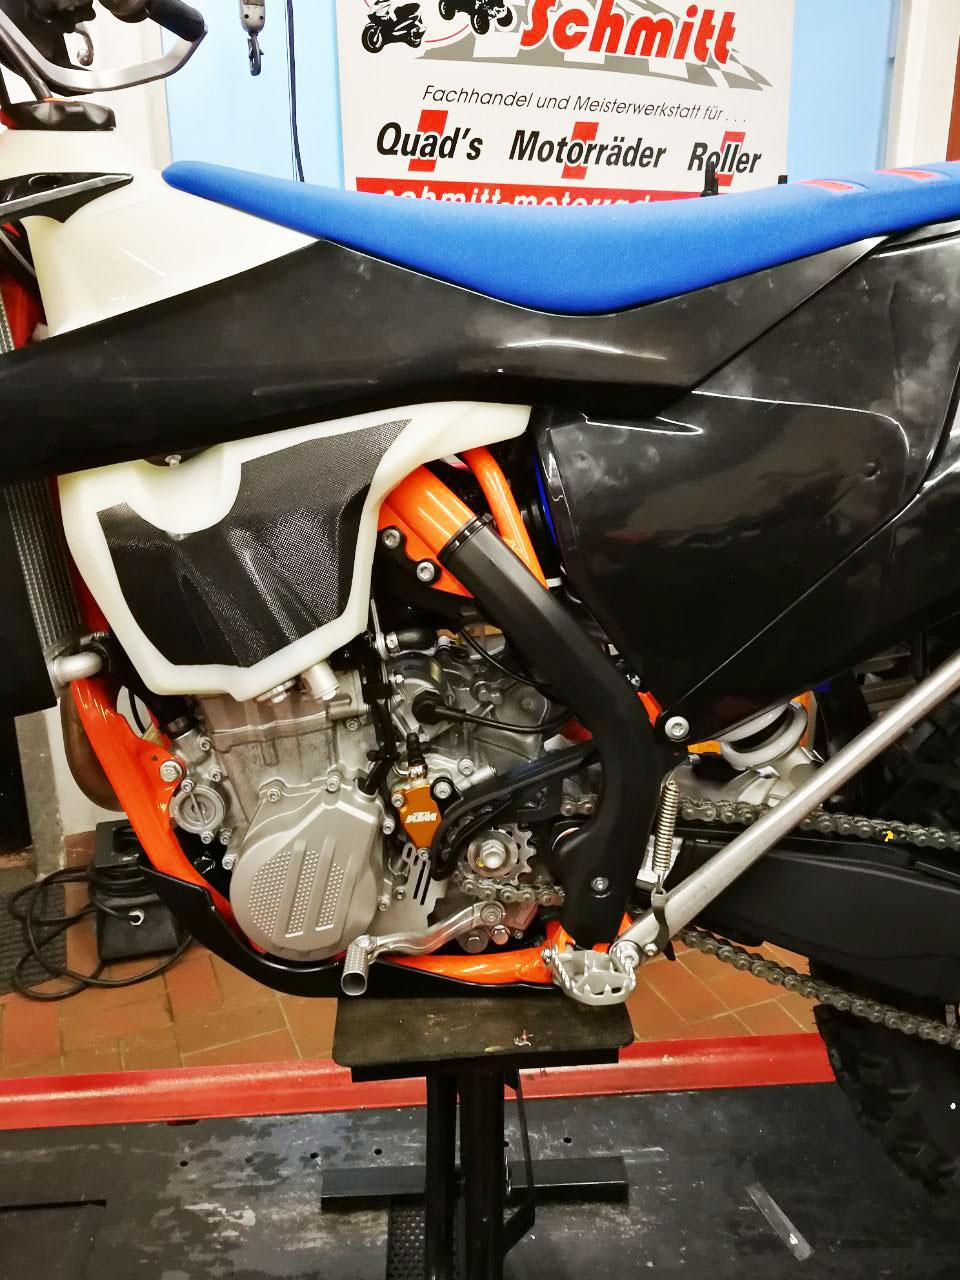 Motorradsport Schmitt in Binningen - KTM Motorradsport Schmitt Racing